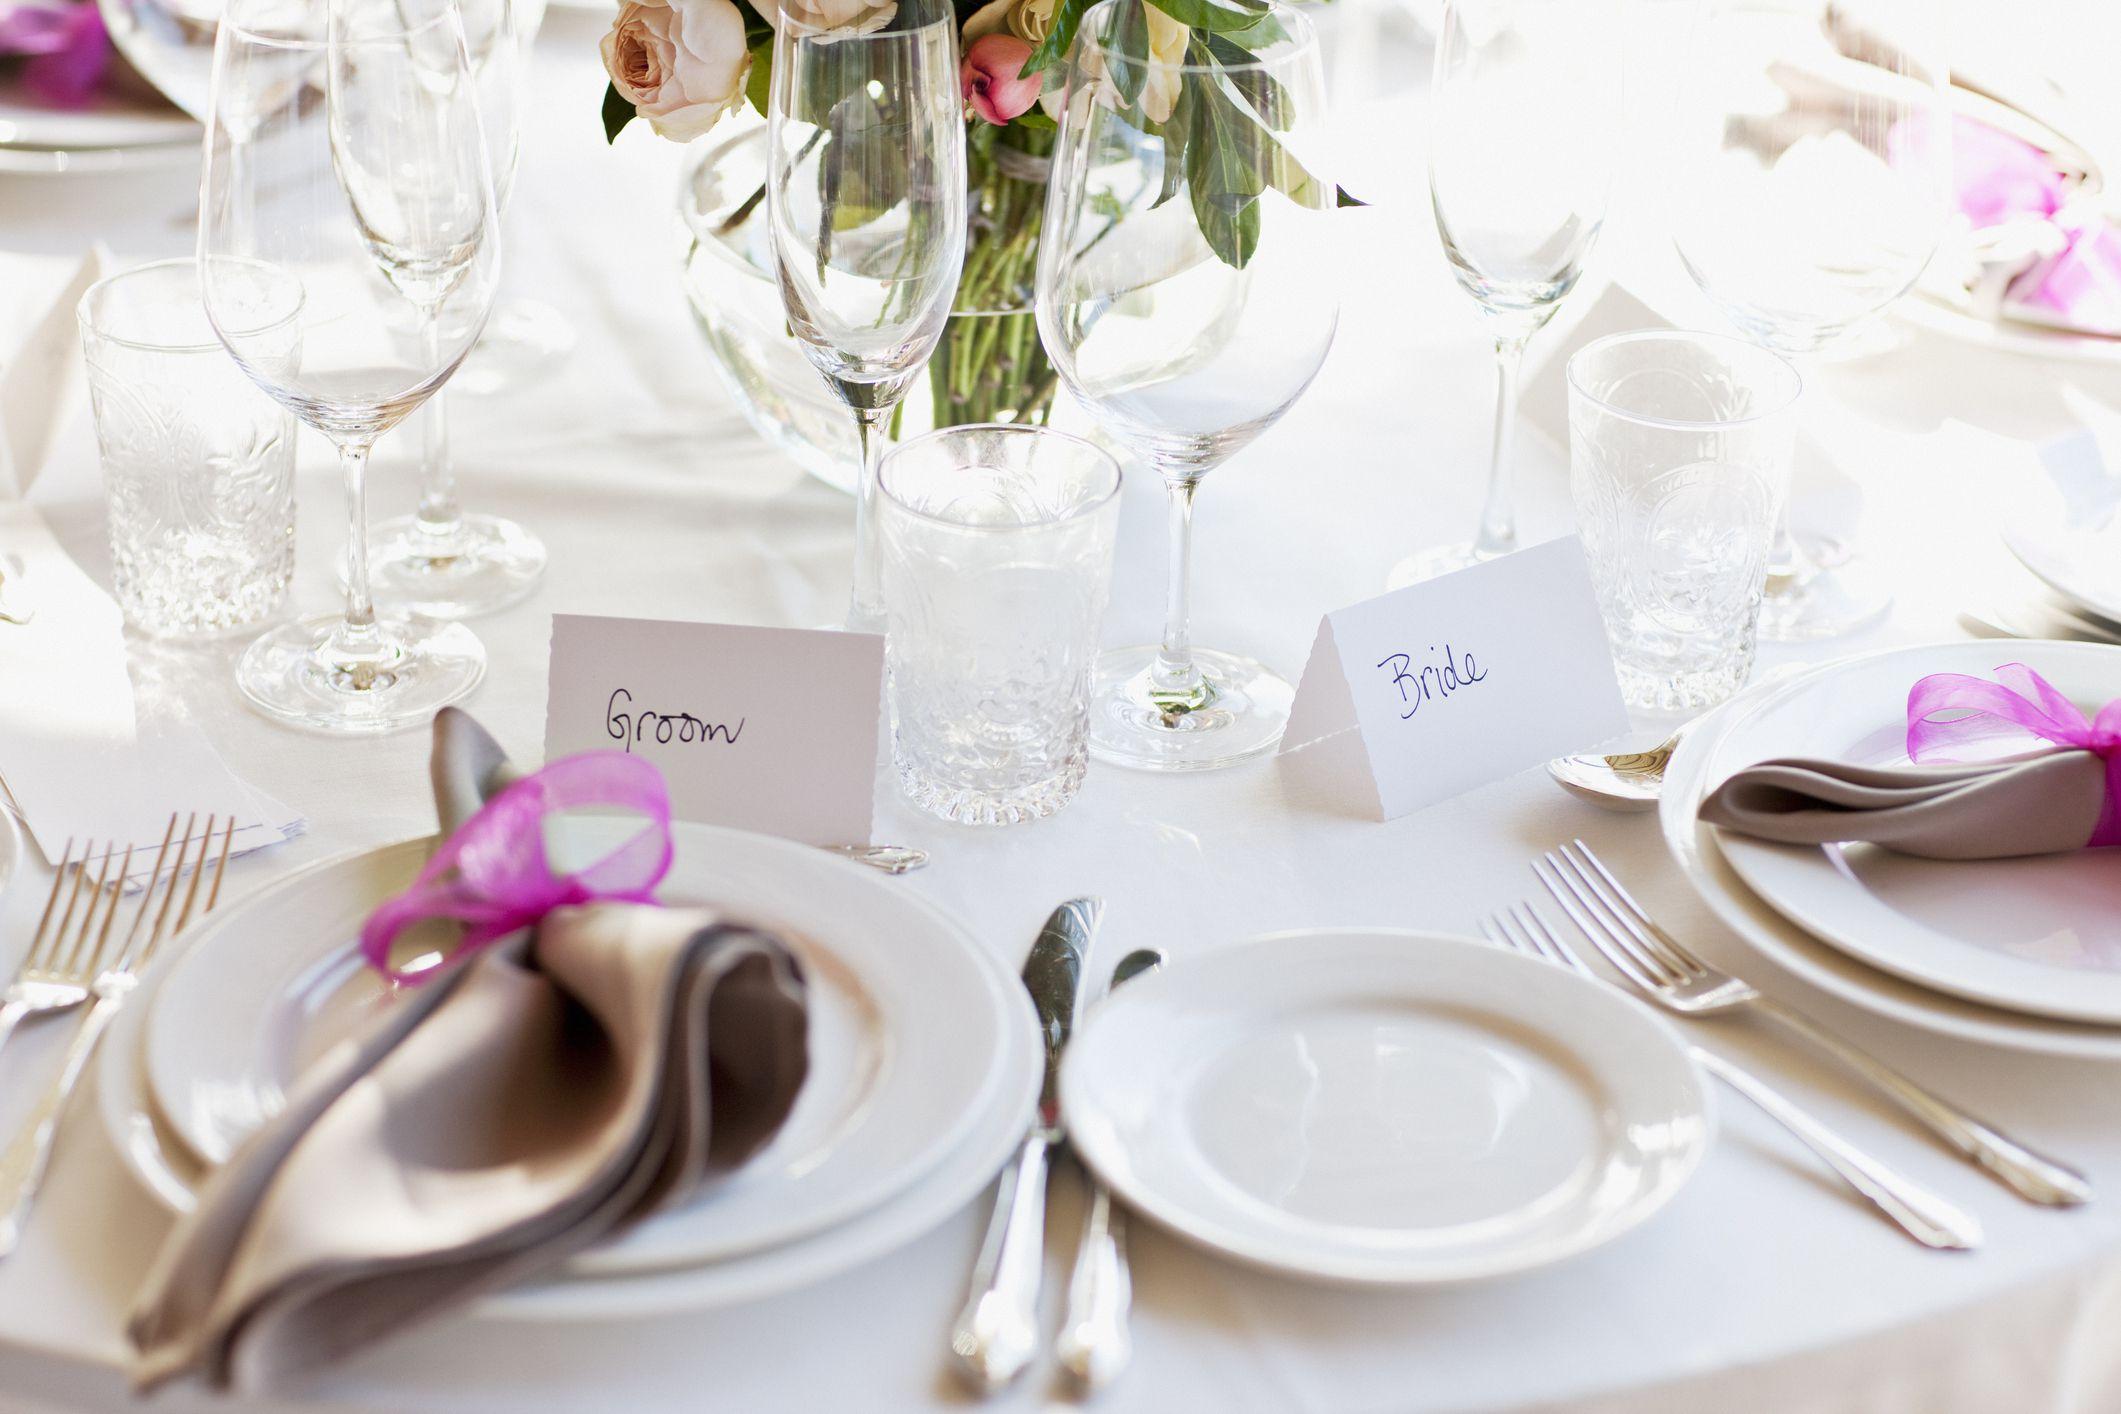 Comic Book Wedding Favors | Giftwedding.co